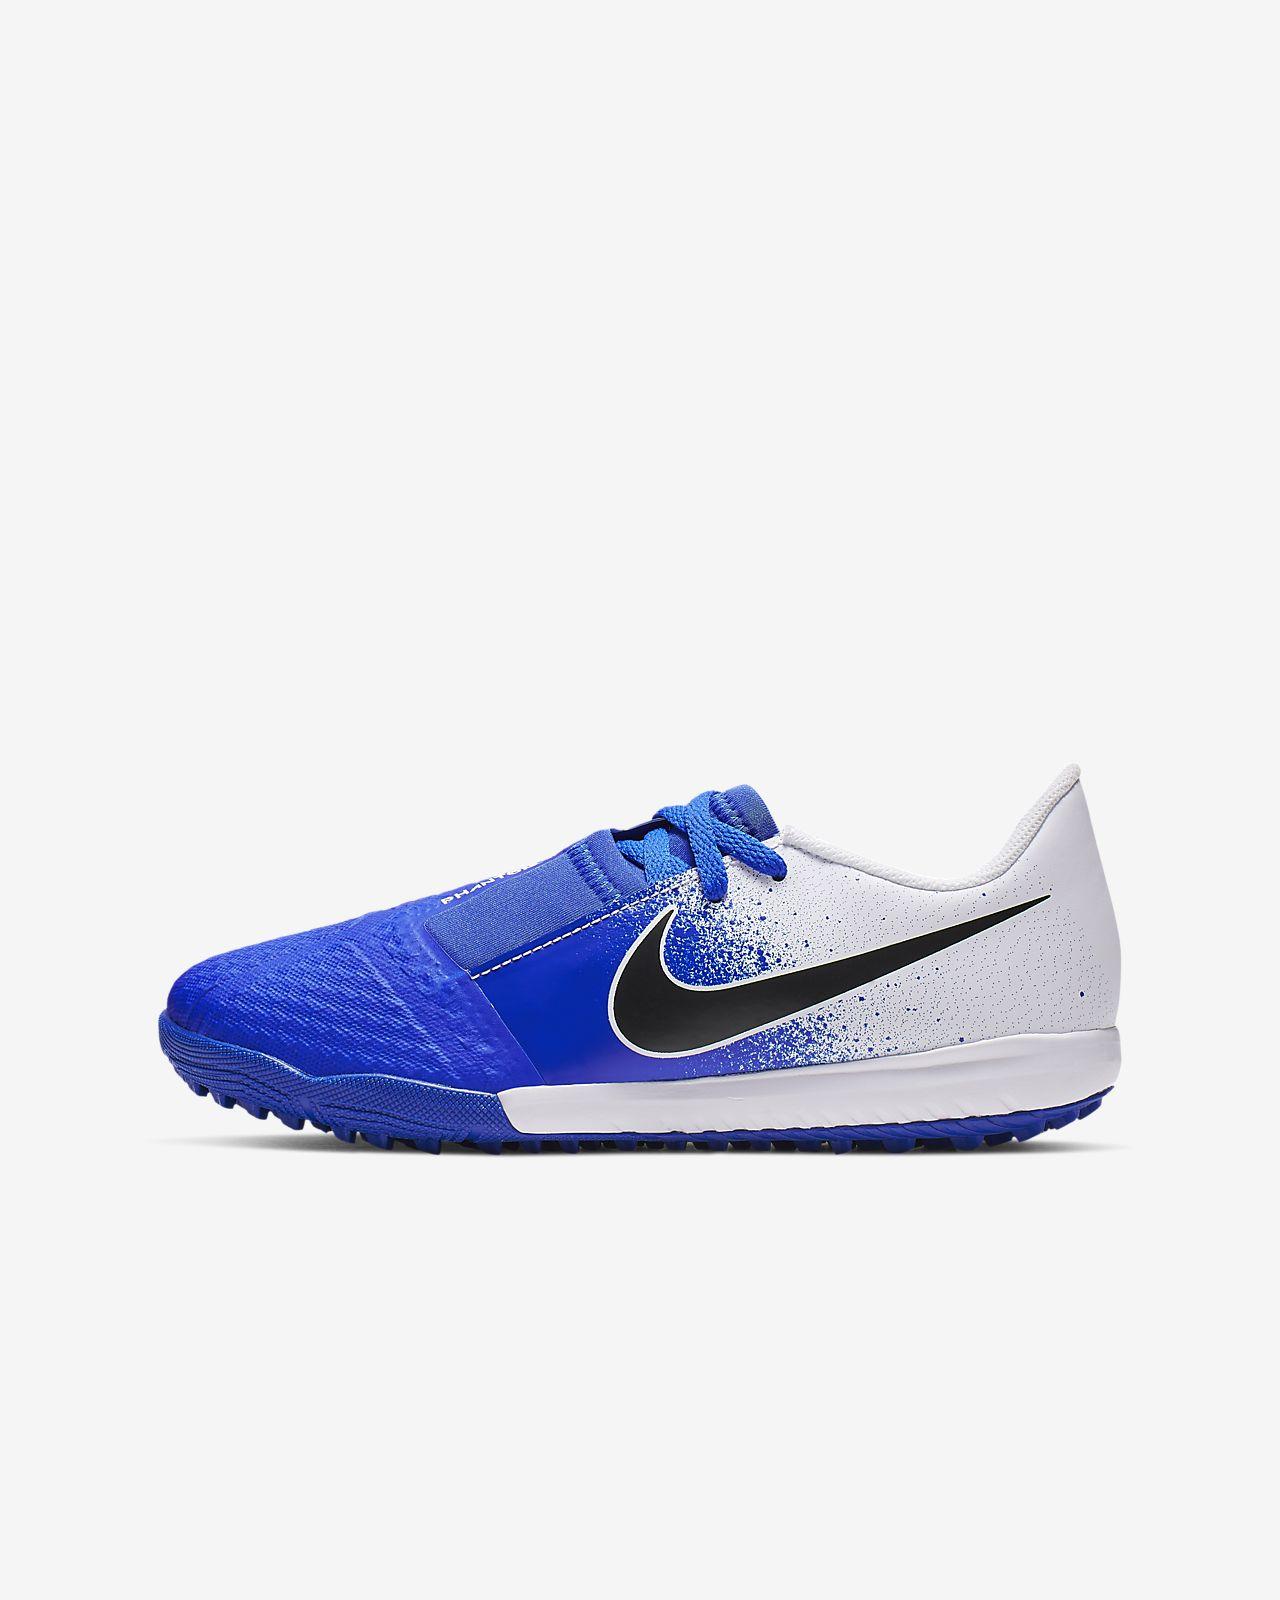 Nike Jr. Phantom Venom Academy TF Younger/Older Kids' Turf Football Shoe